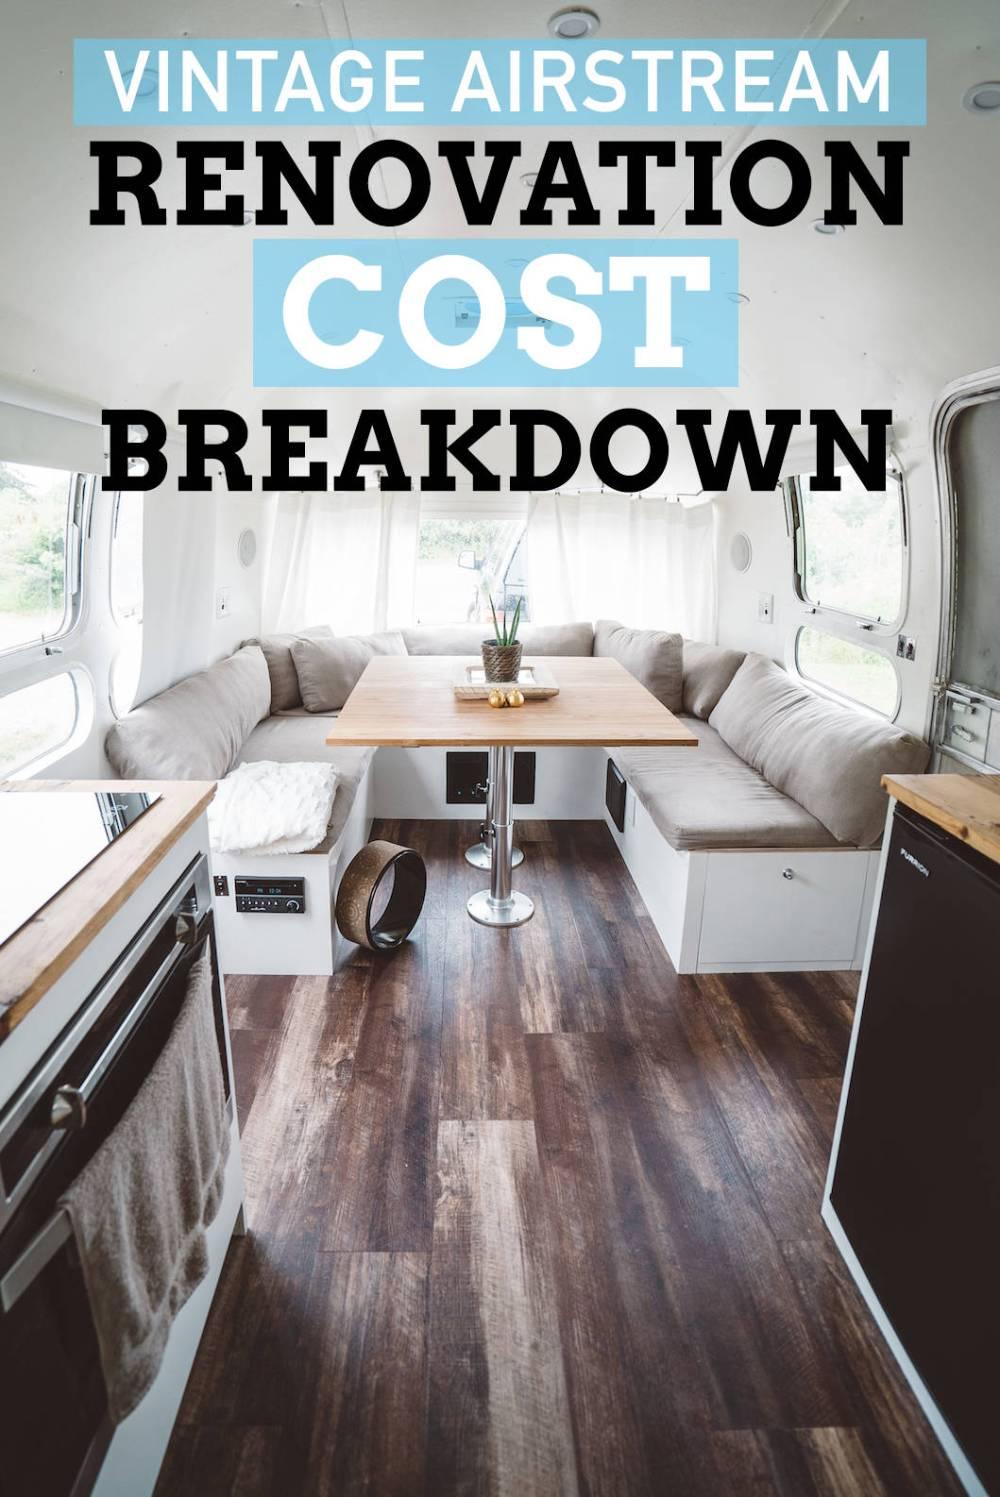 medium resolution of airstream renovation cost breakdown